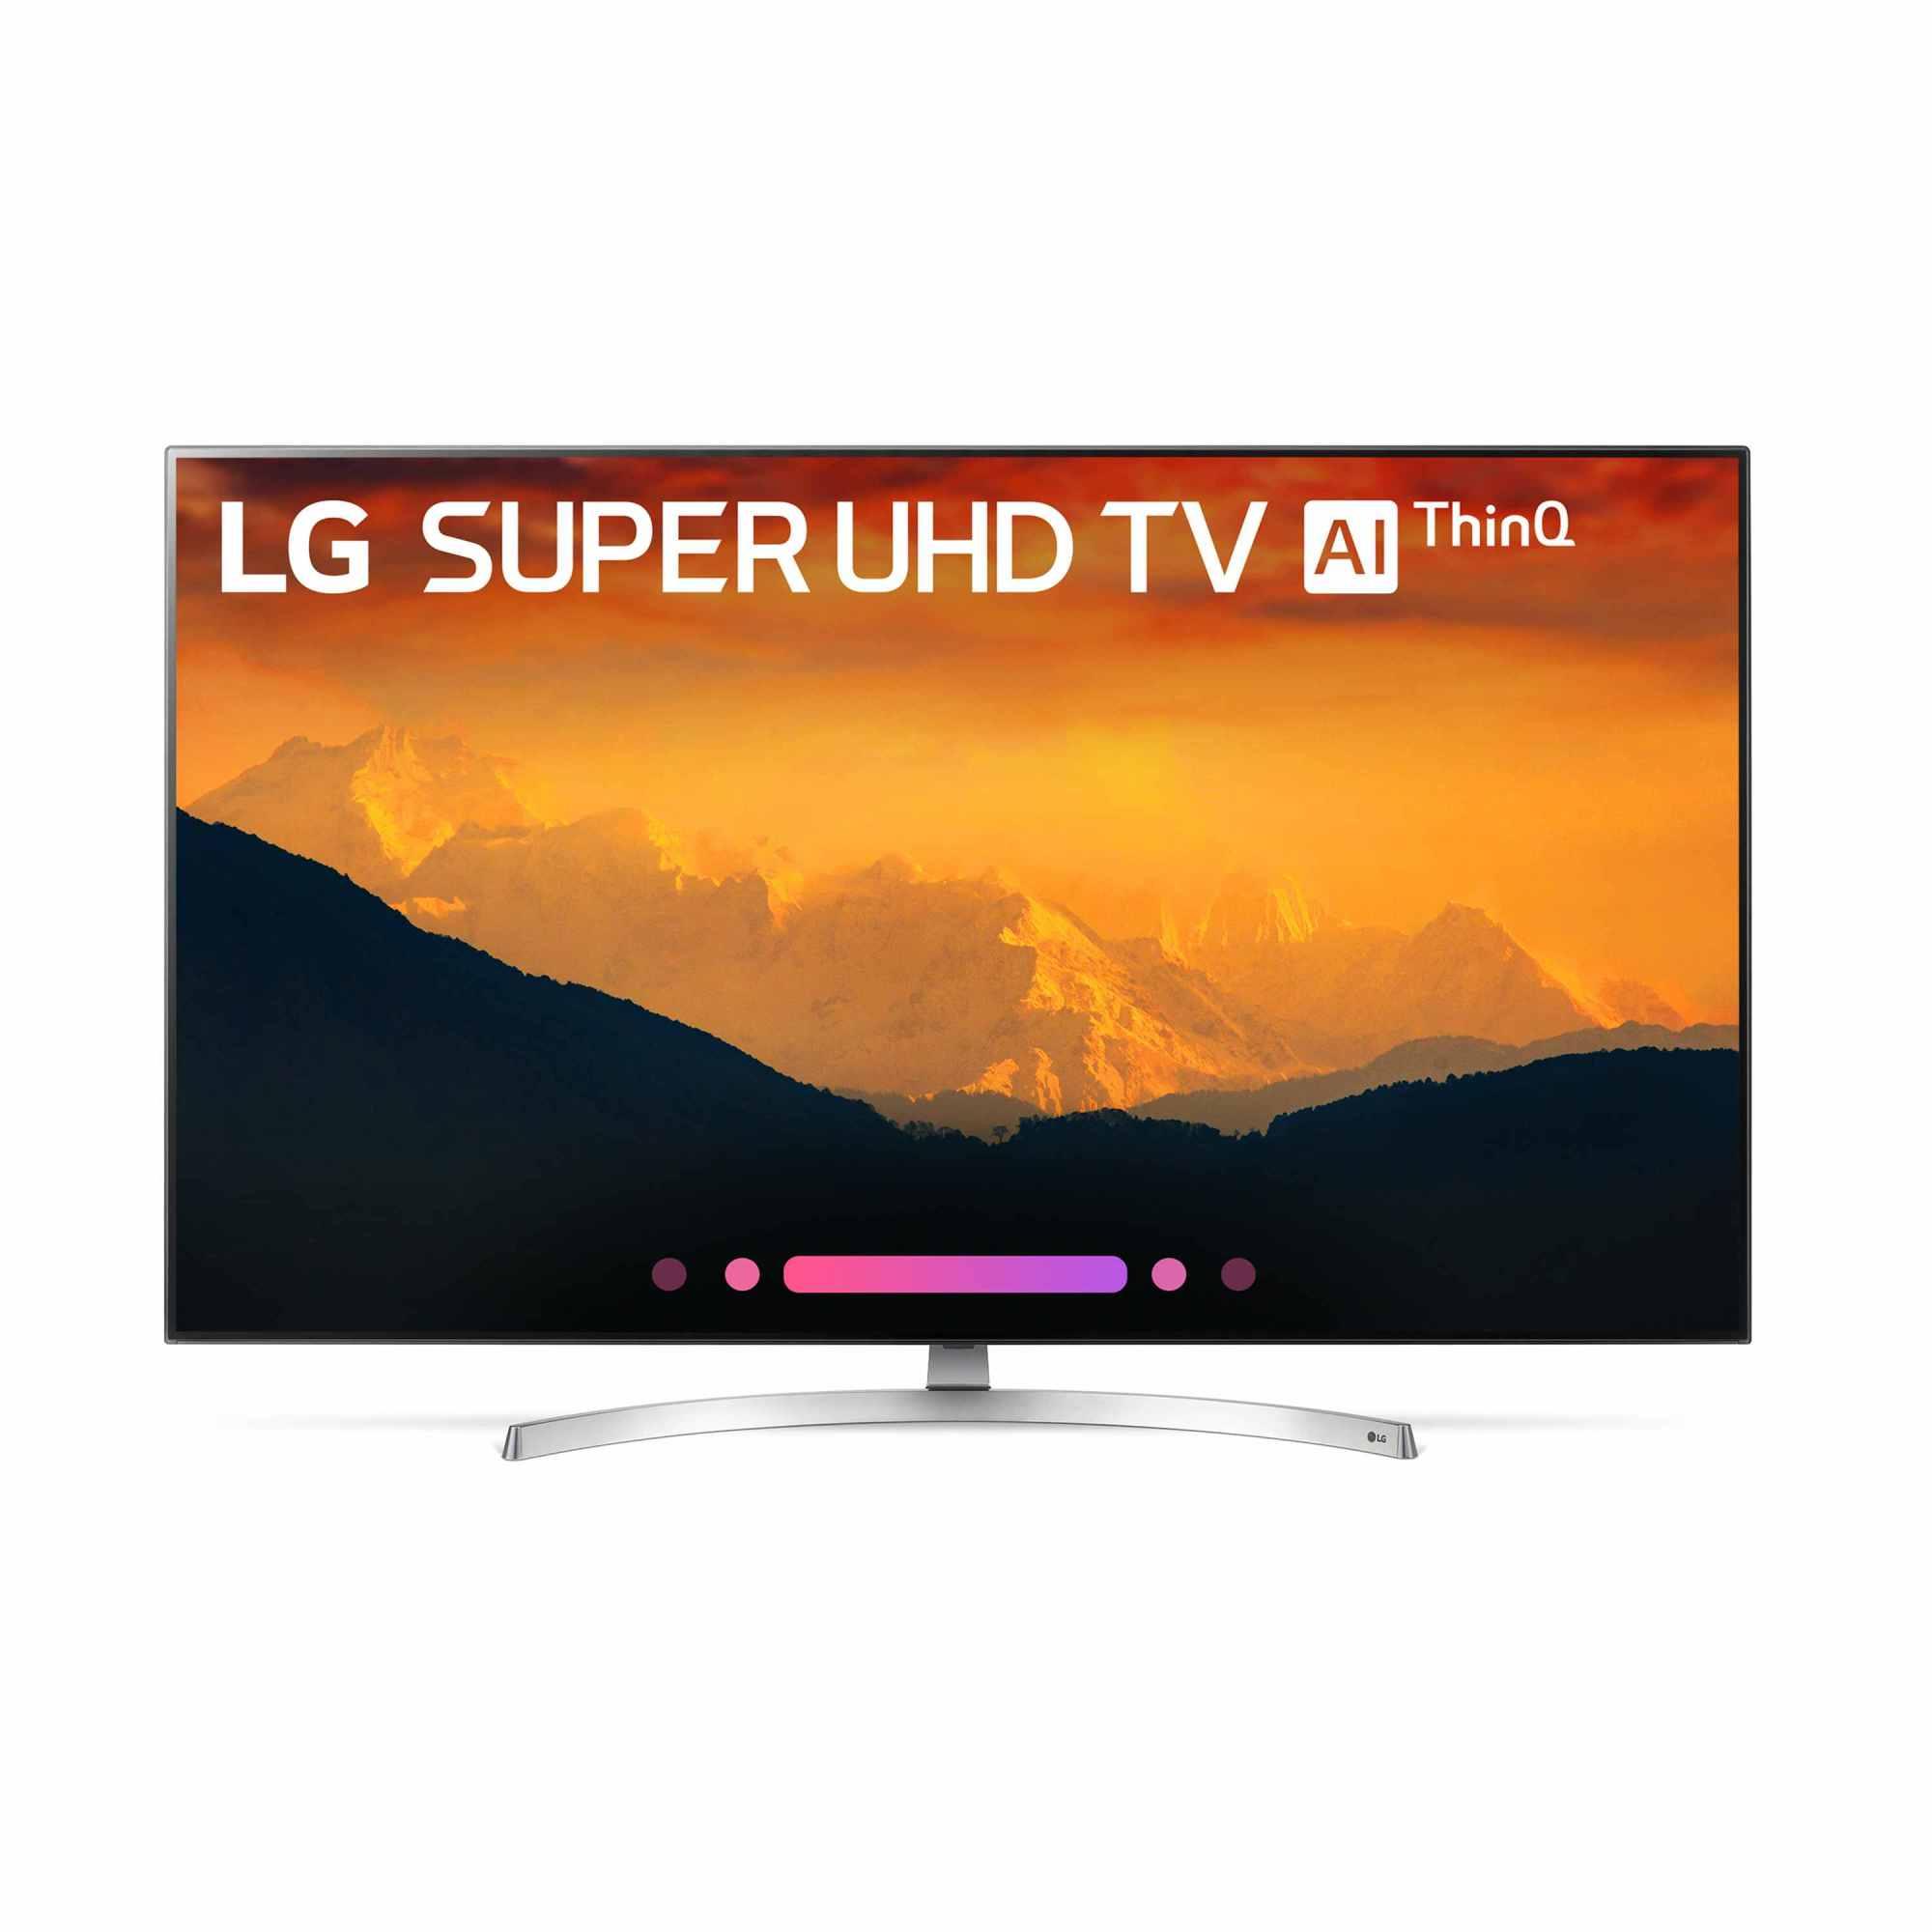 hight resolution of best for streaming lg 65 4k super uhd tv